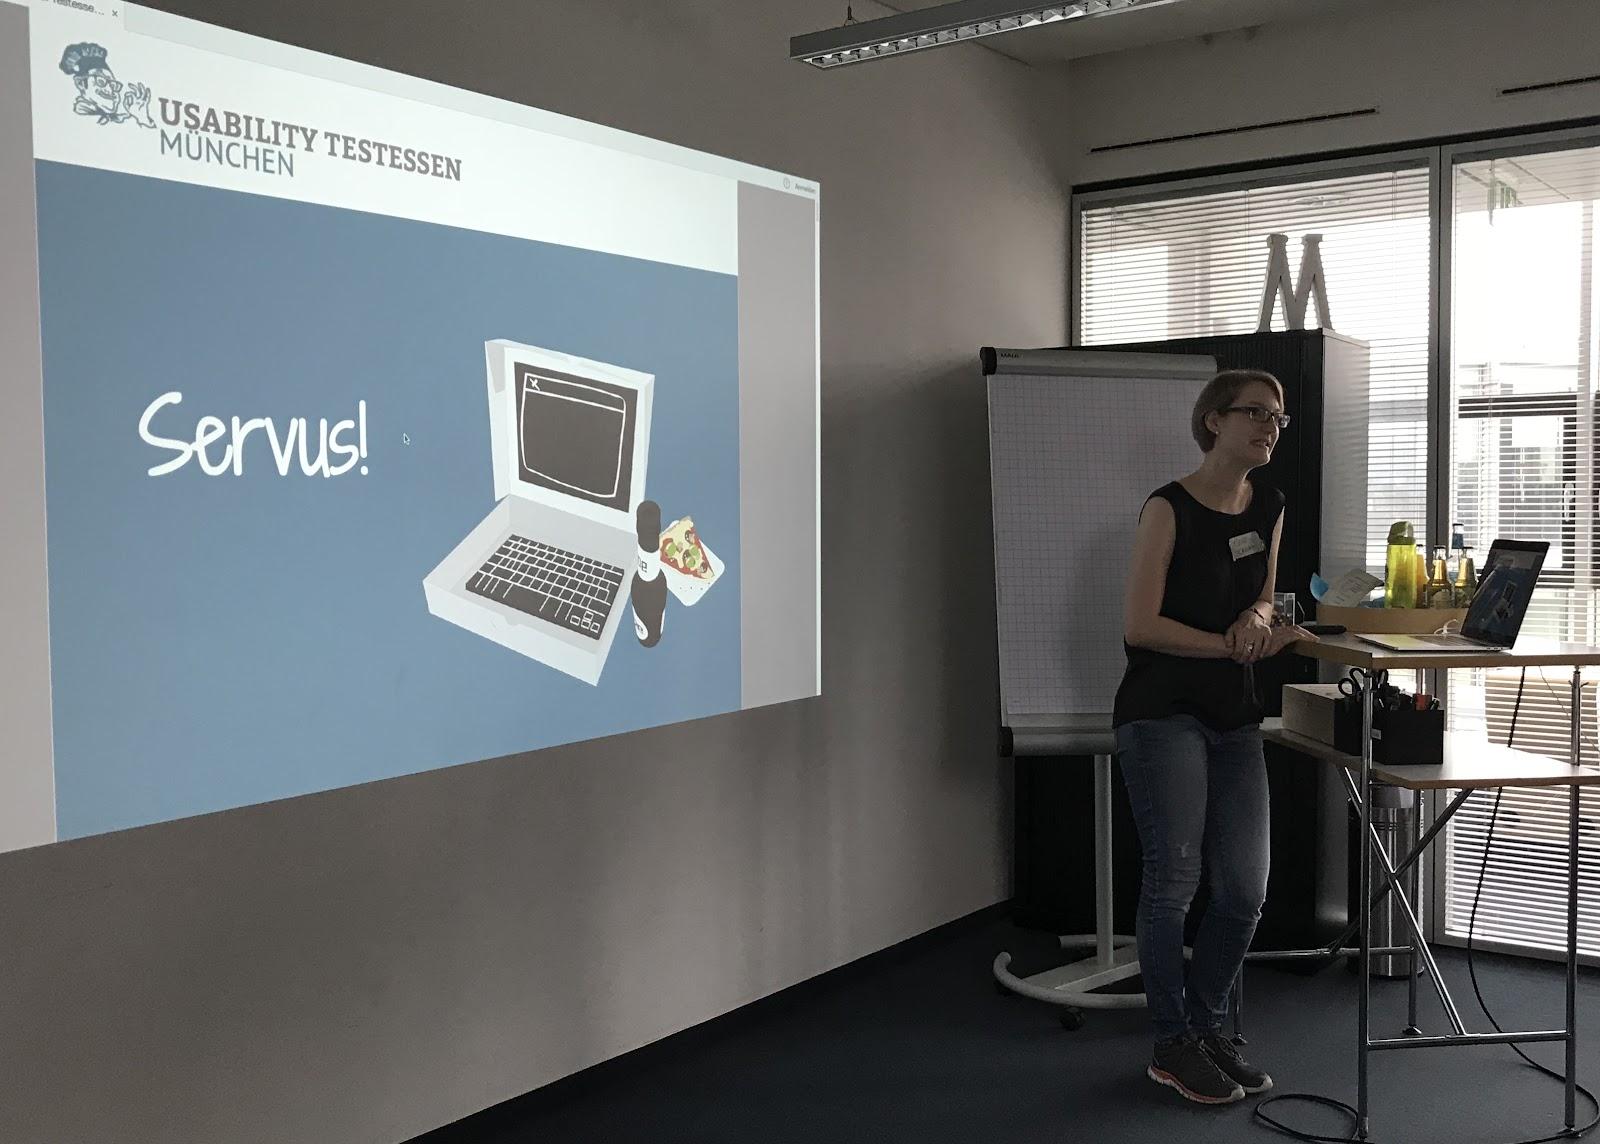 Einführung Usability Testessen